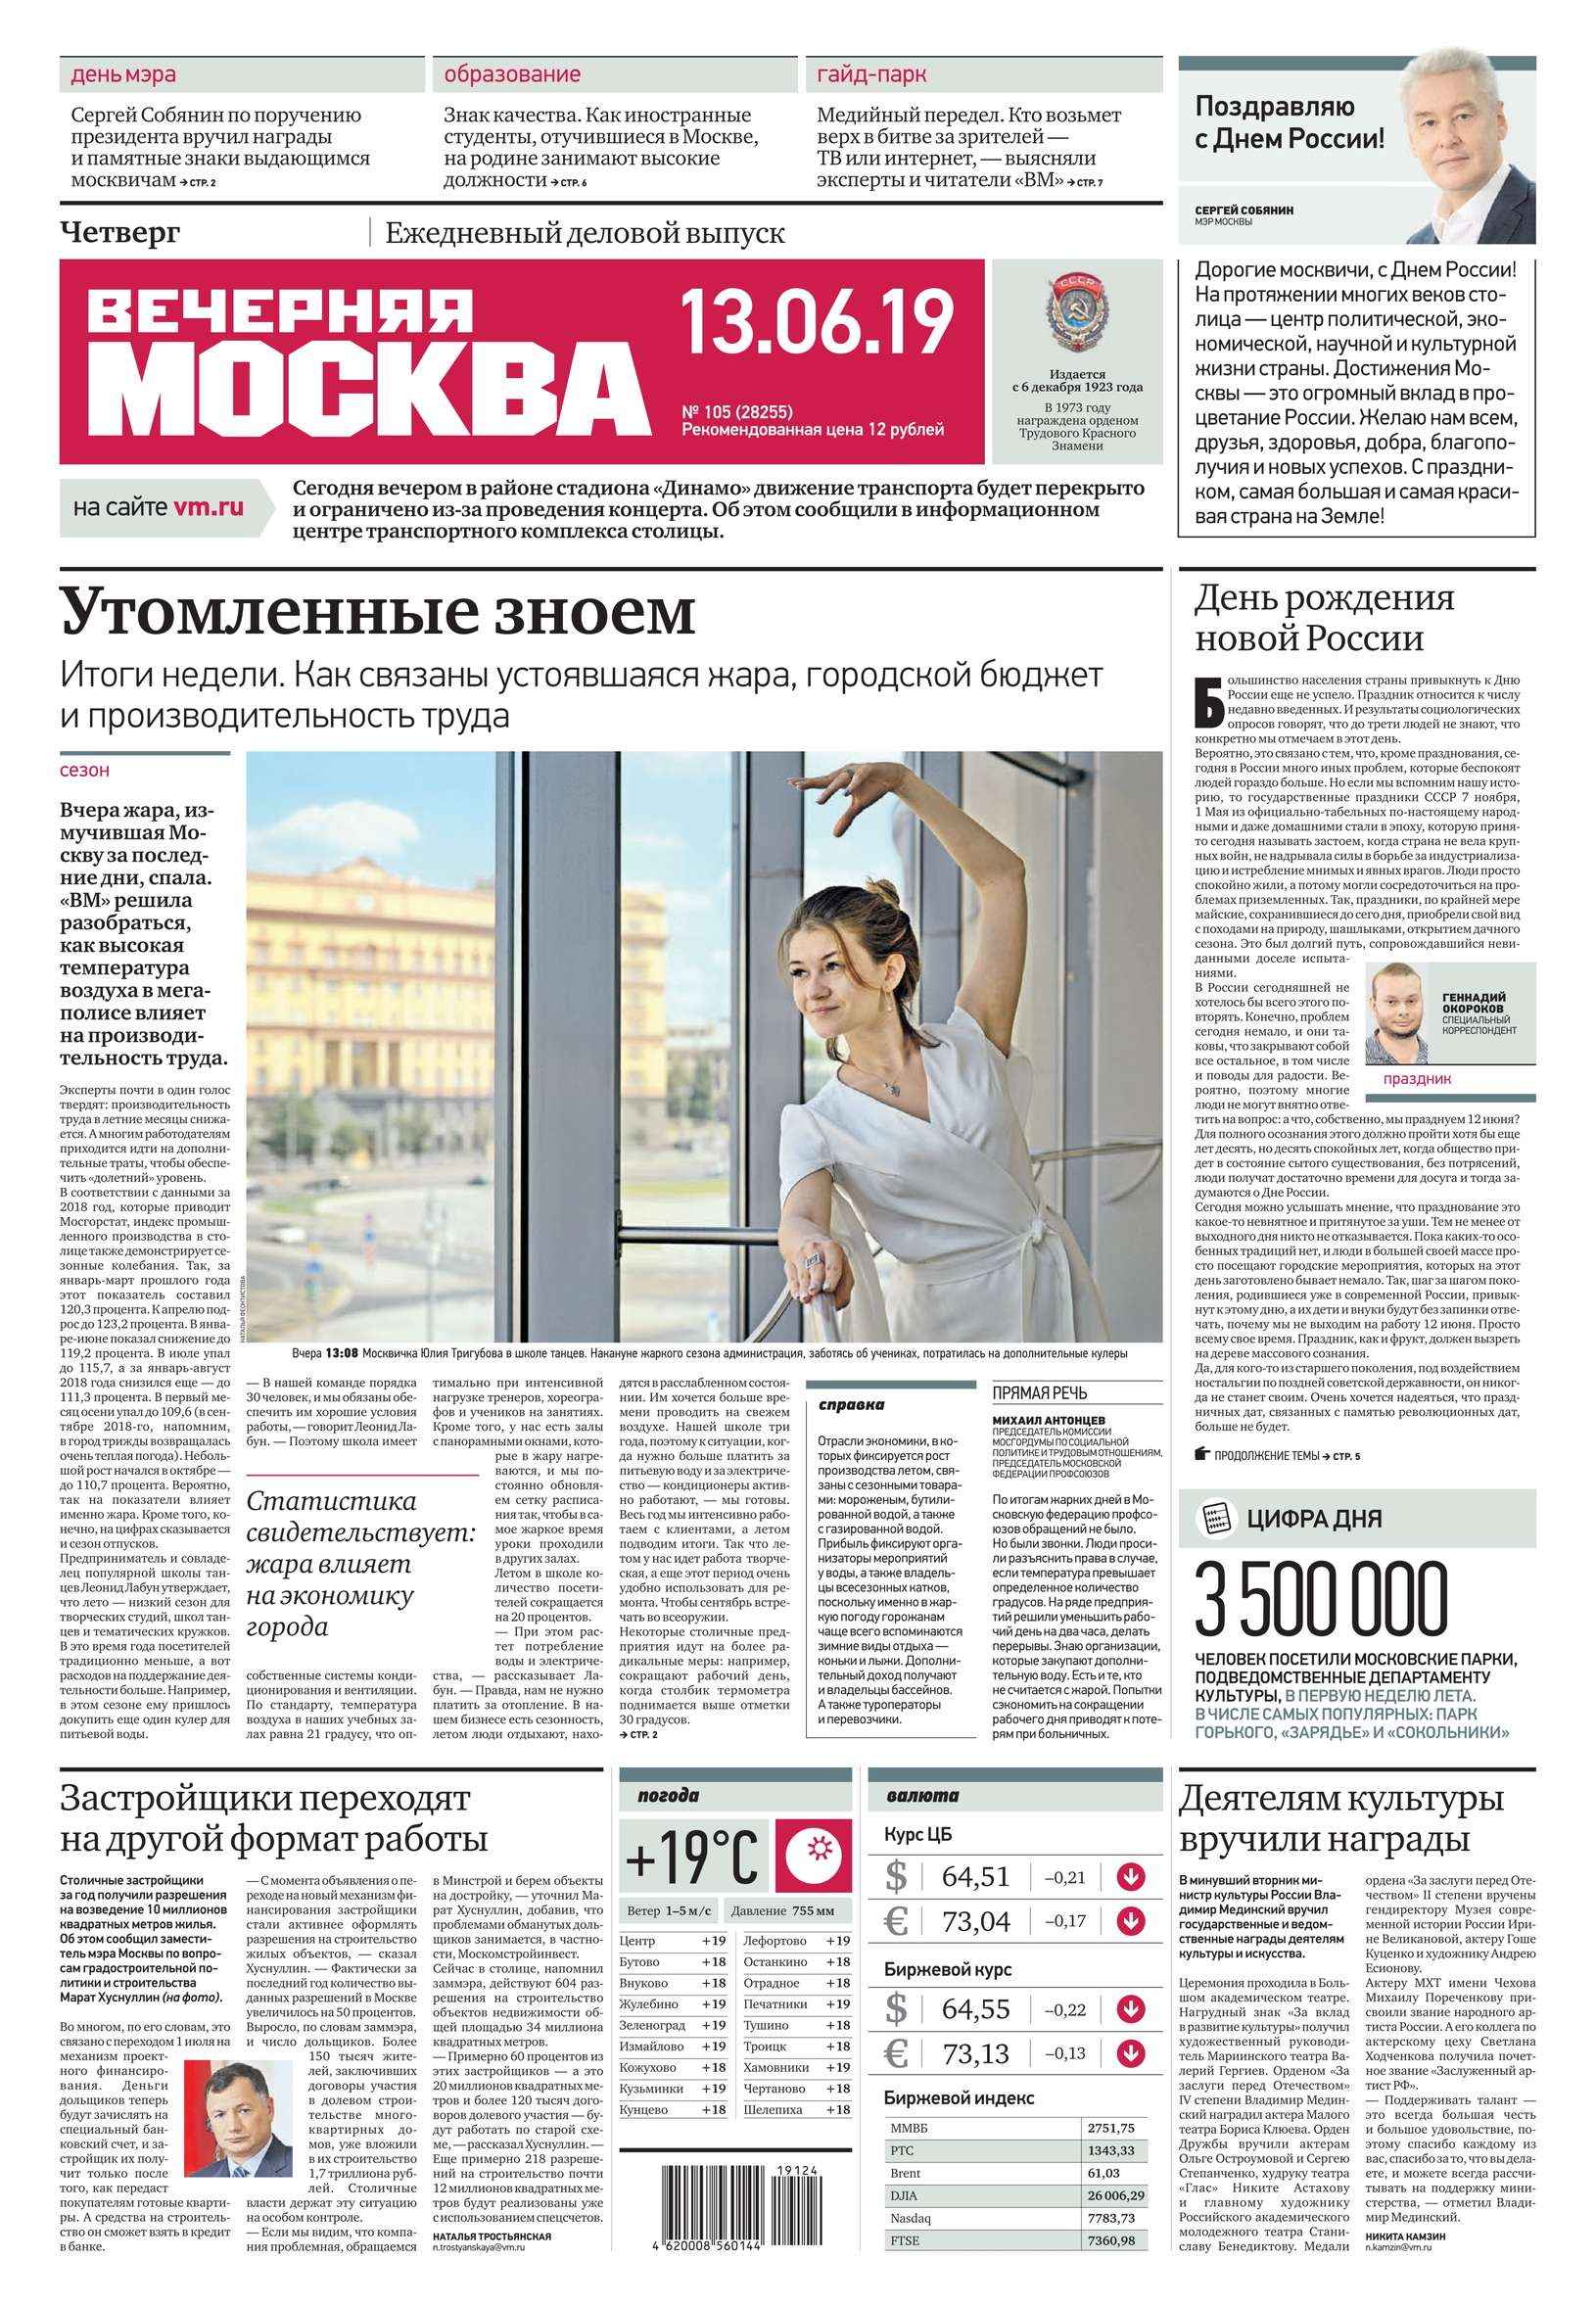 Редакция газеты Вечерняя Москва Вечерняя Москва 105-2019